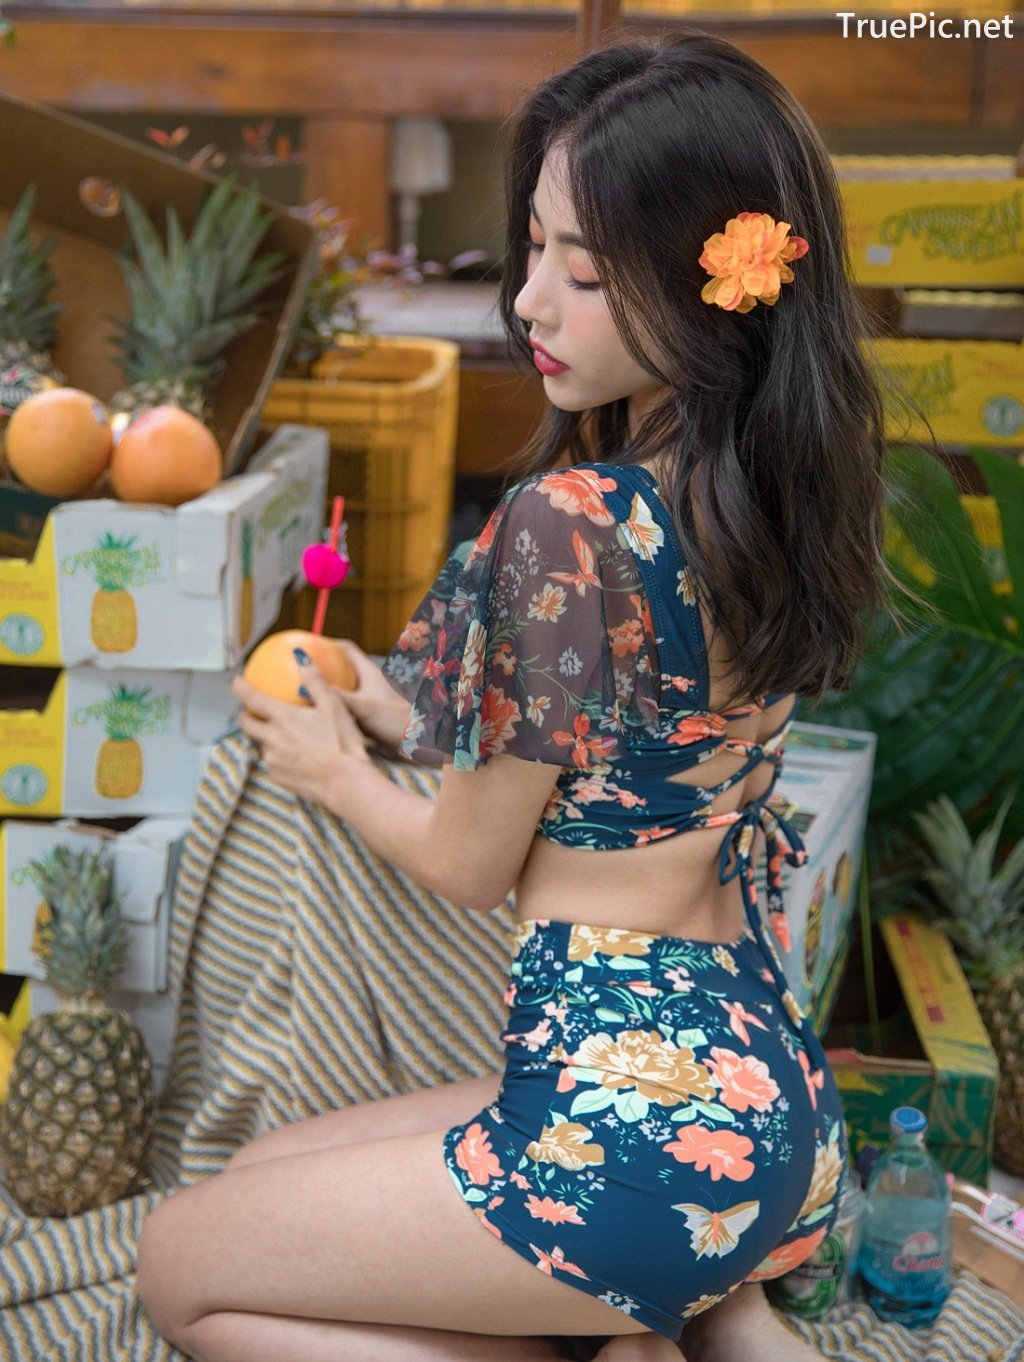 Image-An-Seo-Rin-Flower-and-Butterfly-Bikini-Korean-Model-Fashion-TruePic.net- Picture-1